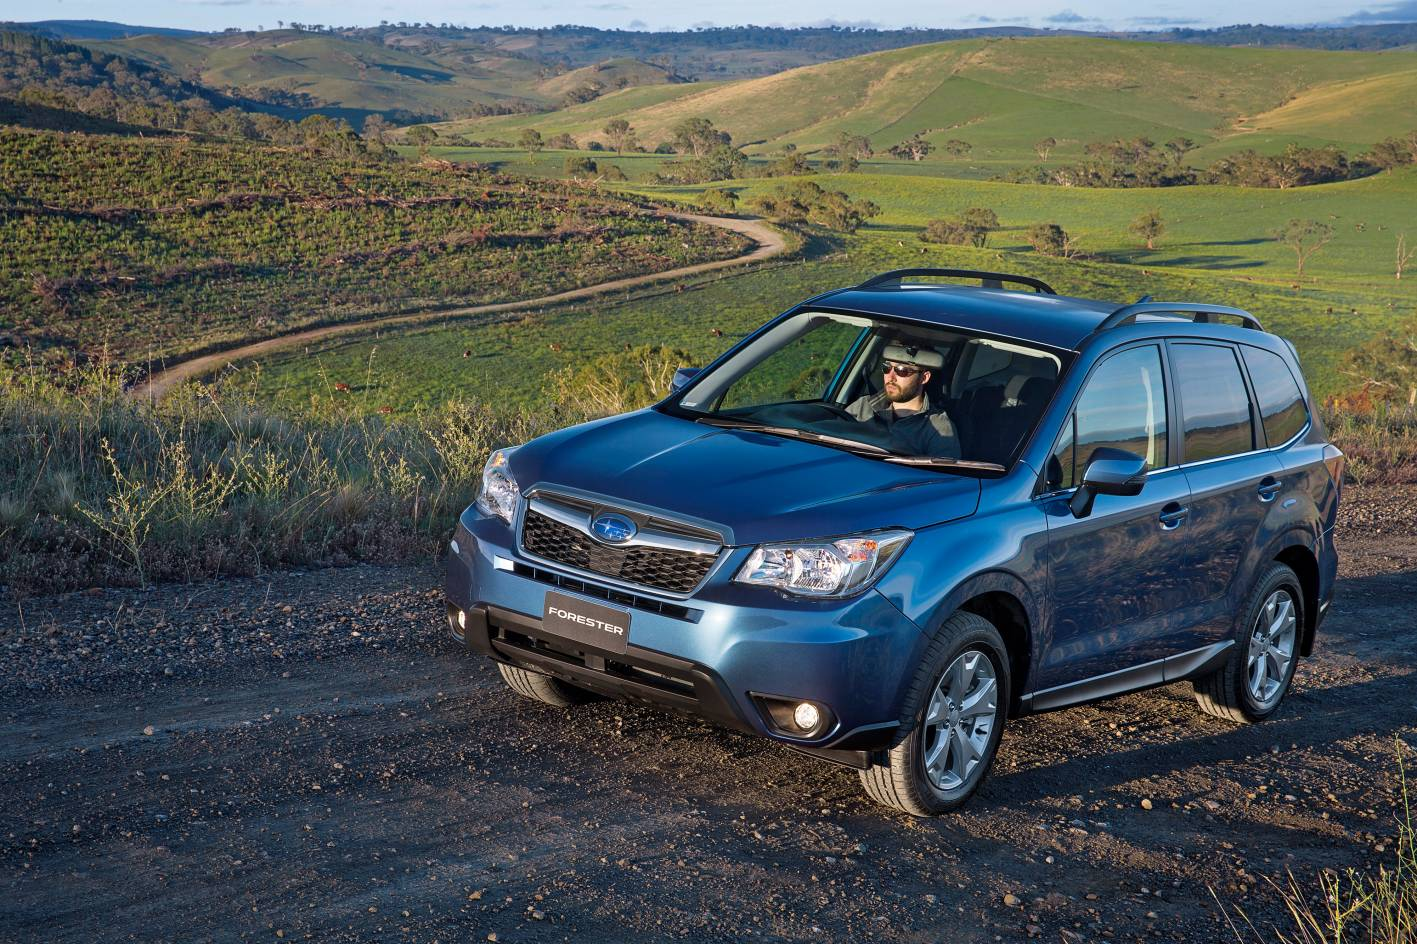 Subaru Outback Size Comparison >> Subaru Forester gains diesel auto and sharper value - ForceGT.com